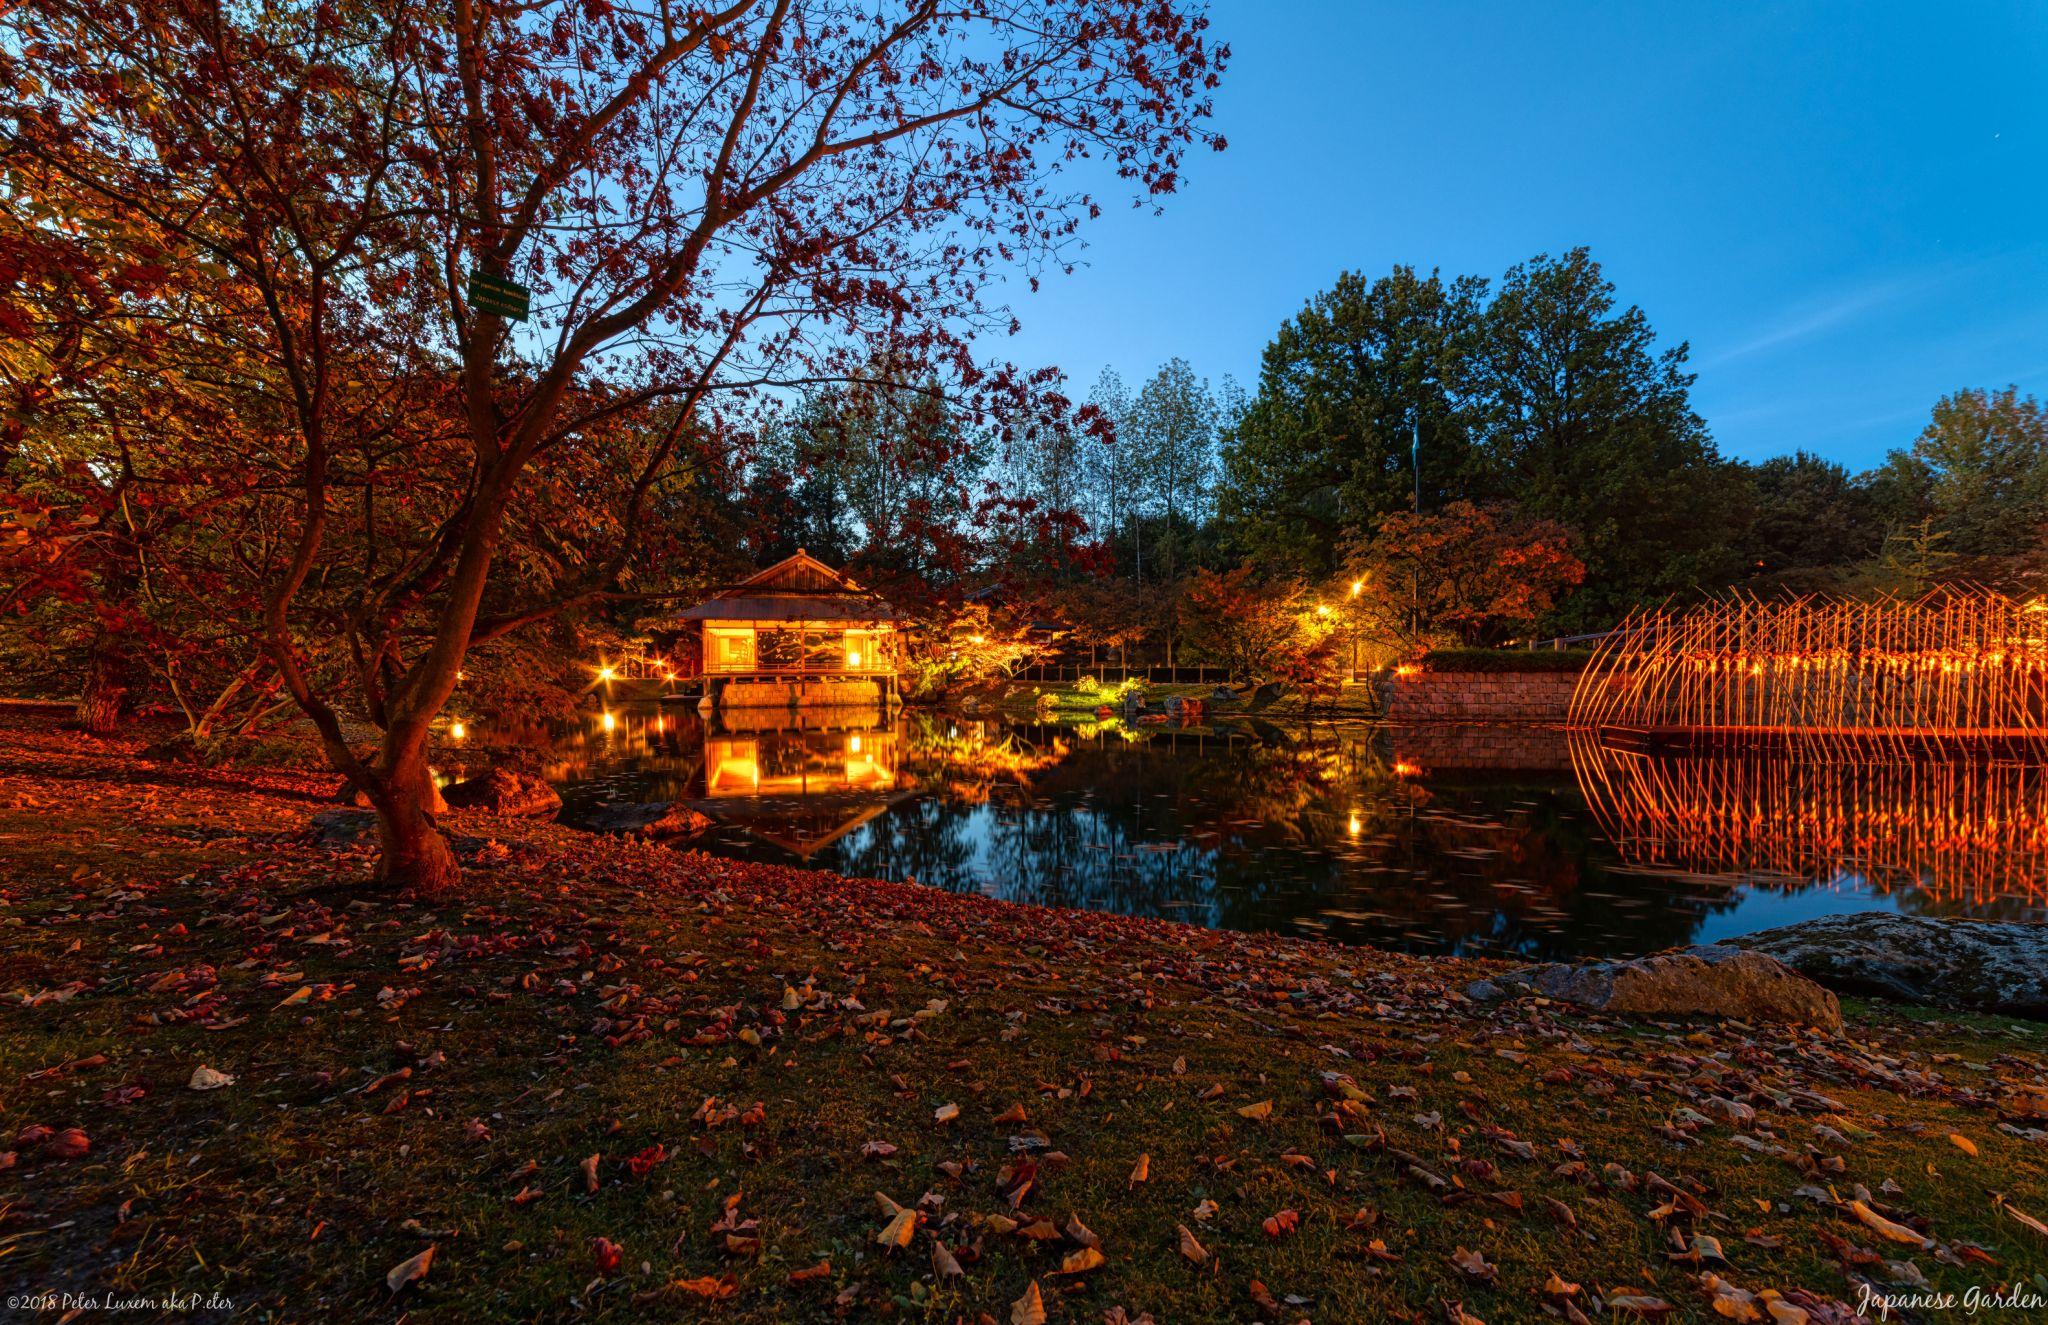 Japenese Garden/Japanse Tuin, Belgium